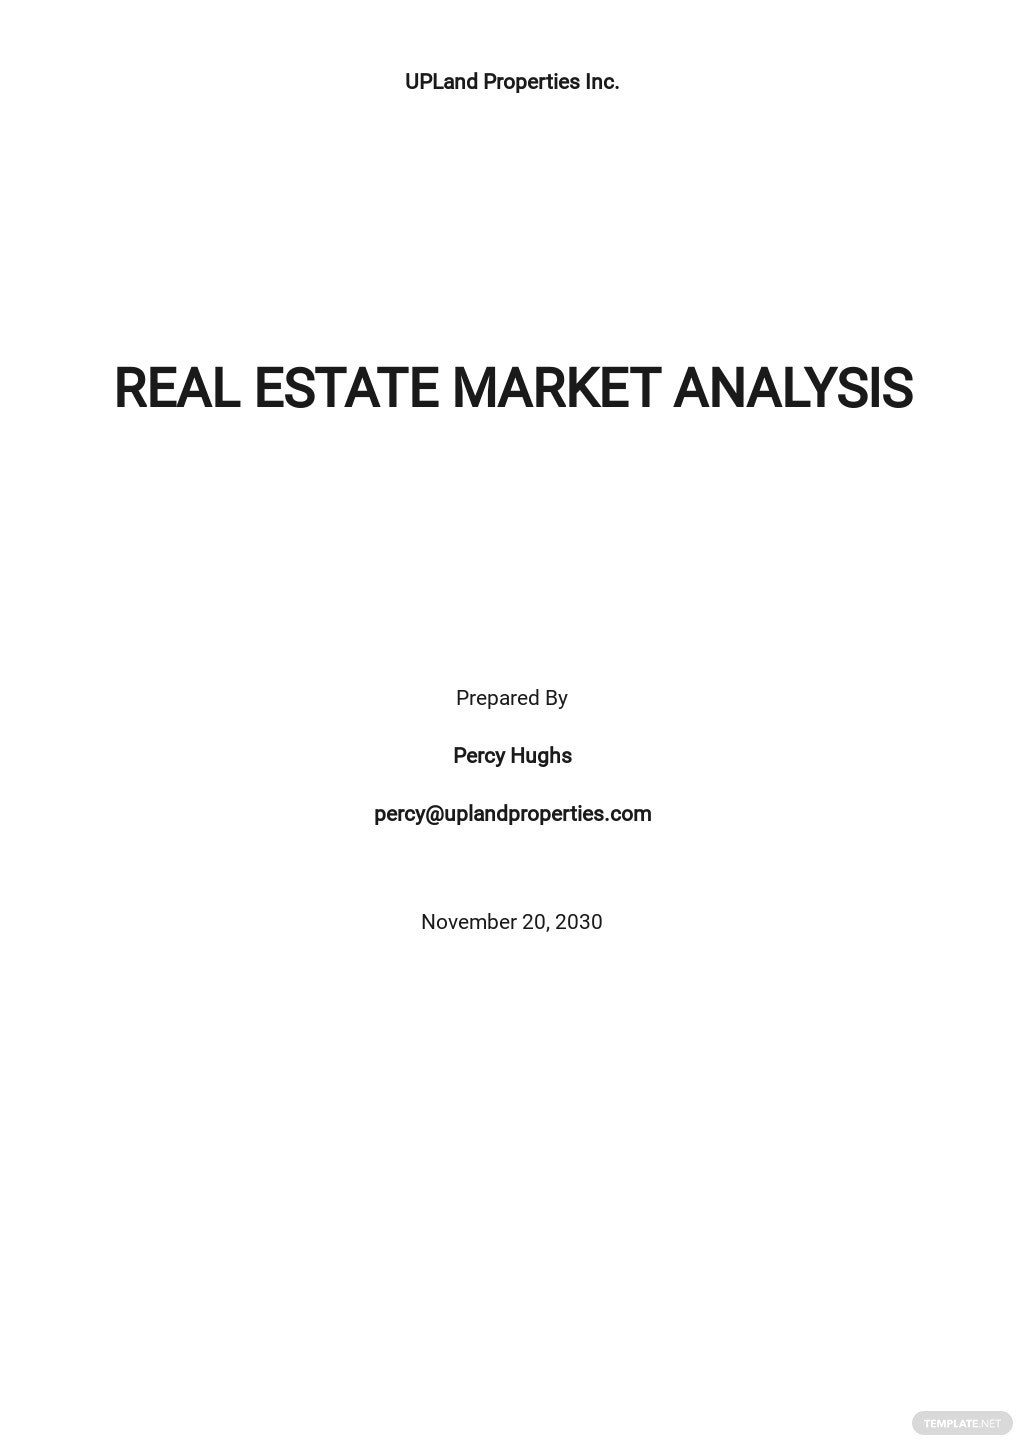 Blank Real Estate Market Analysis Template